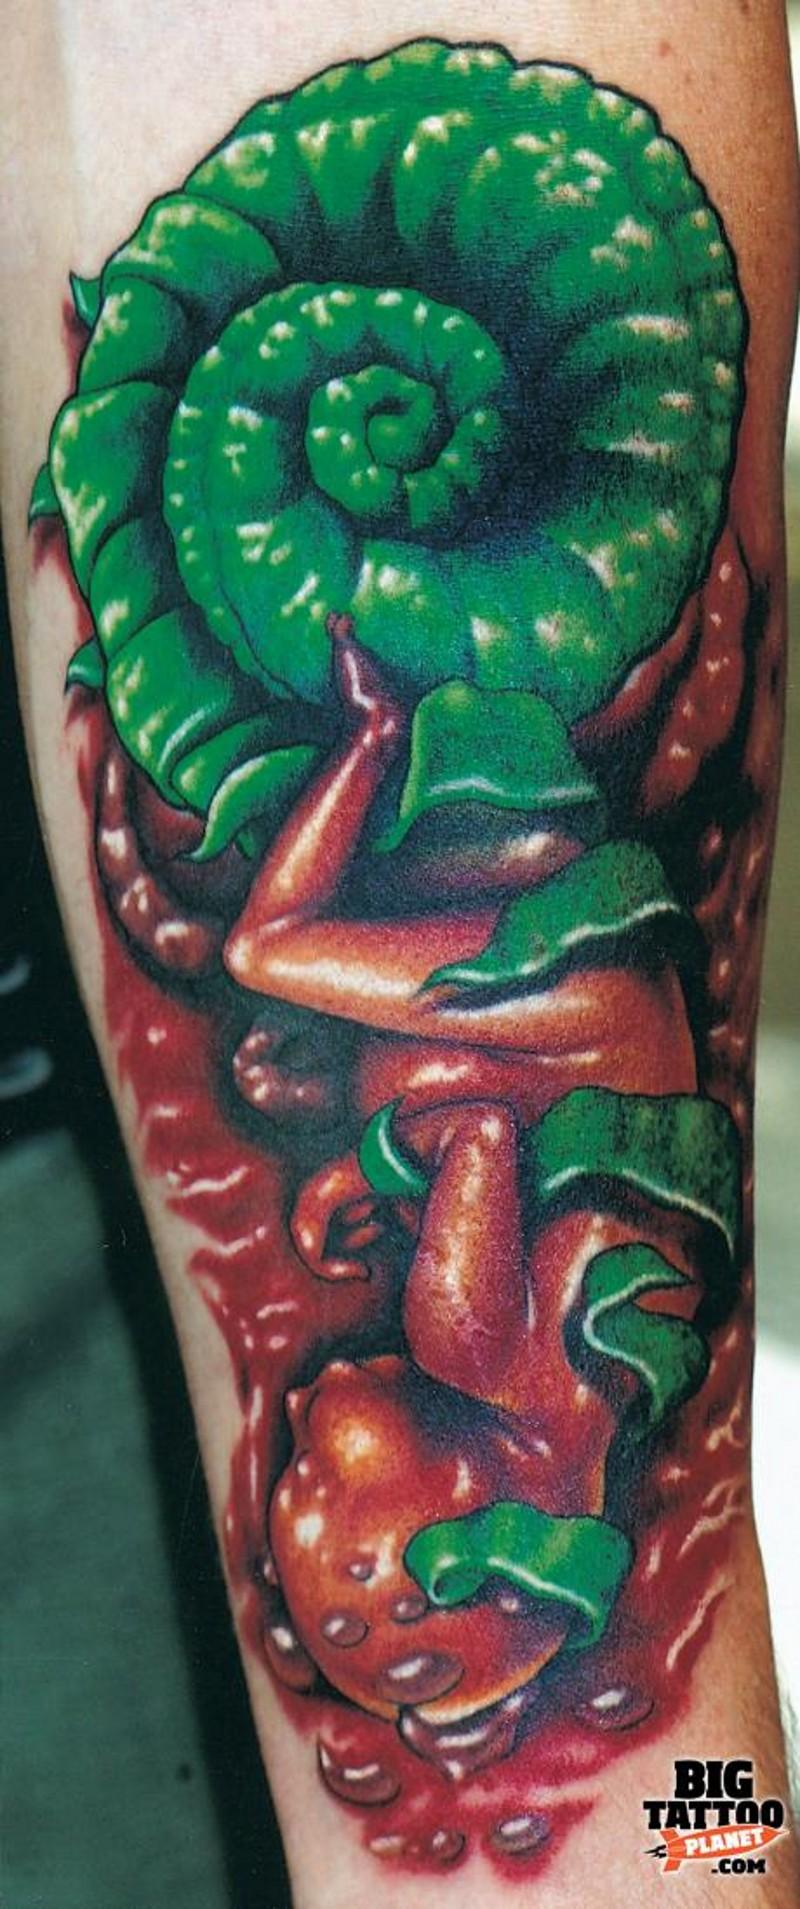 Unusual 3D like human embryo tattoo on arm